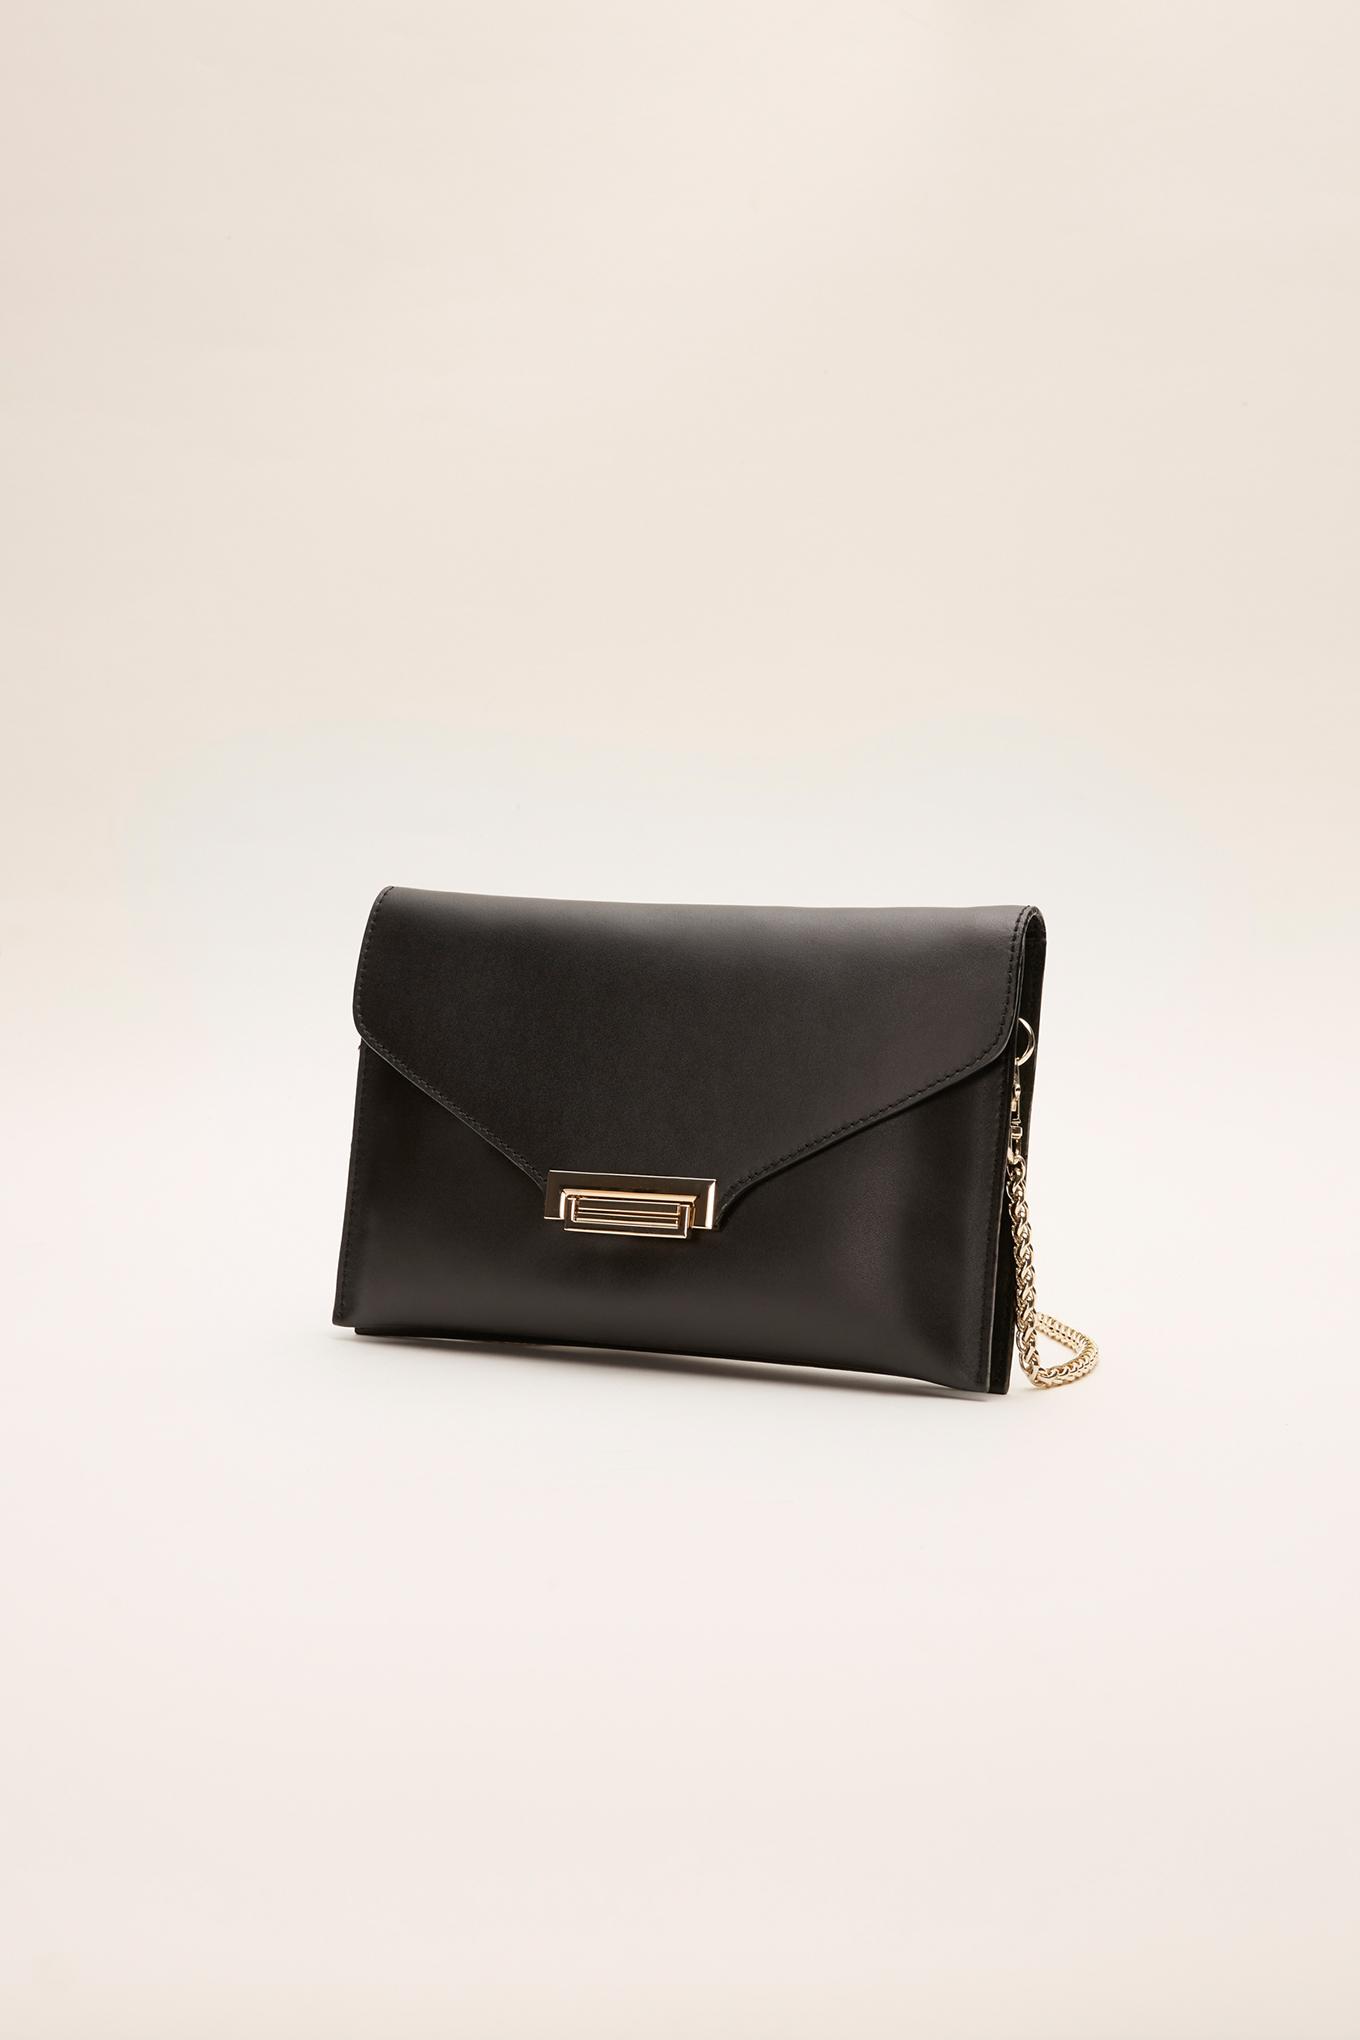 Bag Black Classic Woman